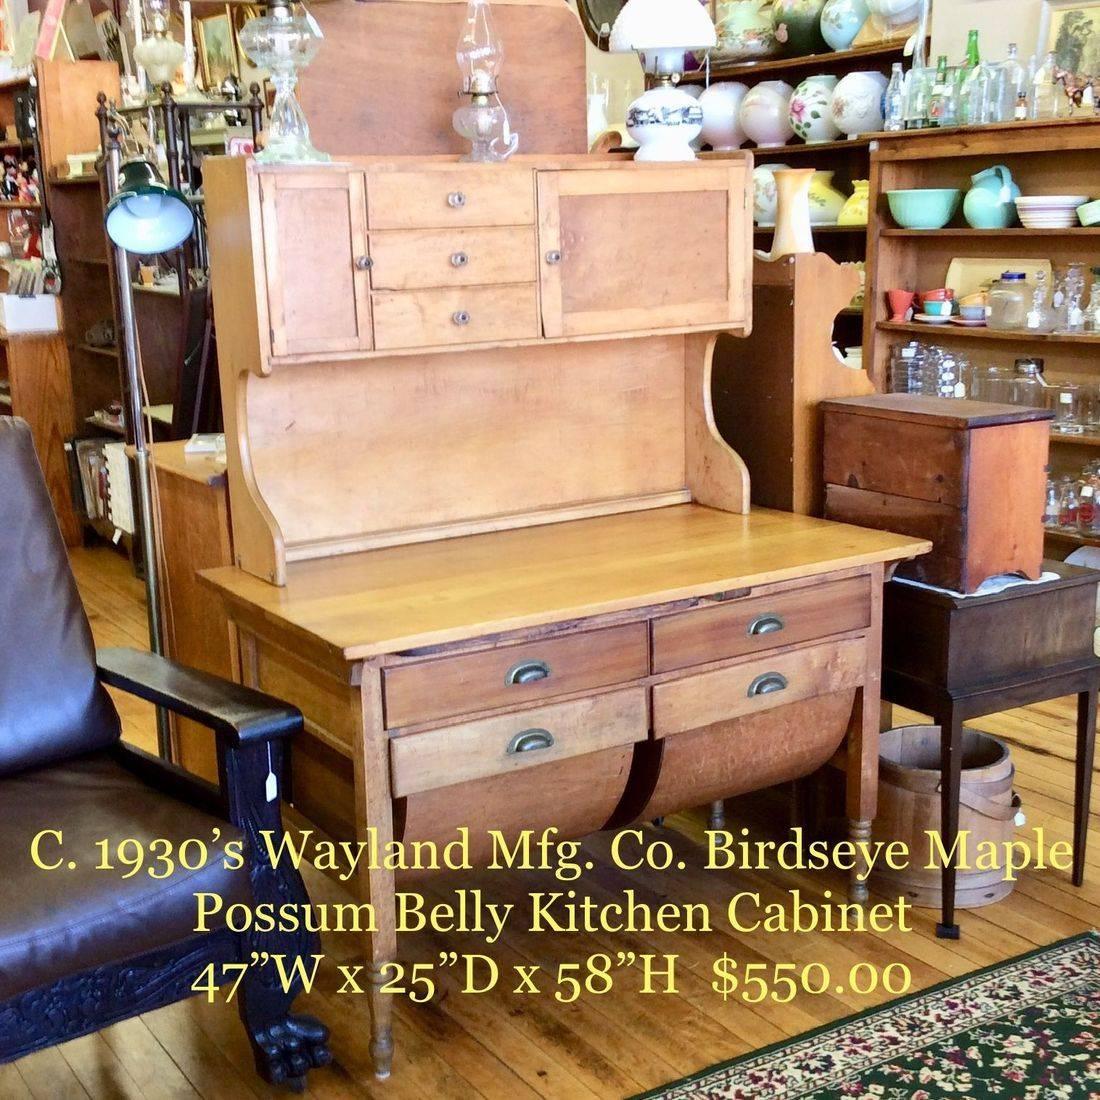 "Circa 1930's Wayland Mfg. co. Birdseye Maple Kitchen Cabinet,  base 47"" W x 25-1/2""D x 30-1/4""H (58-1/2""H w/Top Cabinet)   $550.00"